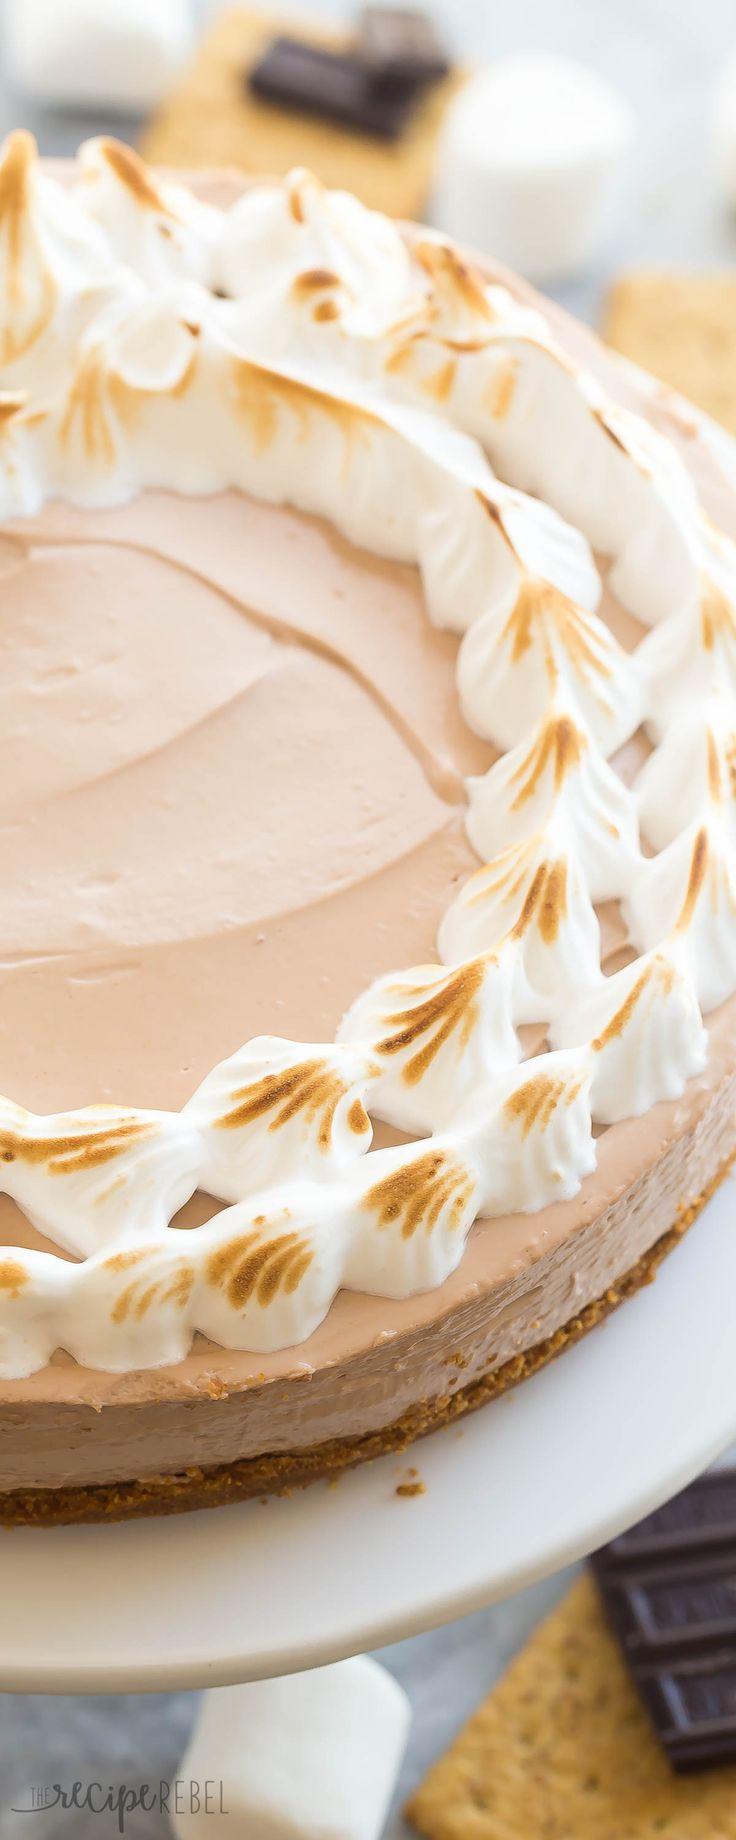 No bake cheesecake, Best cheesecake and Marshmallow cheesecake on ...